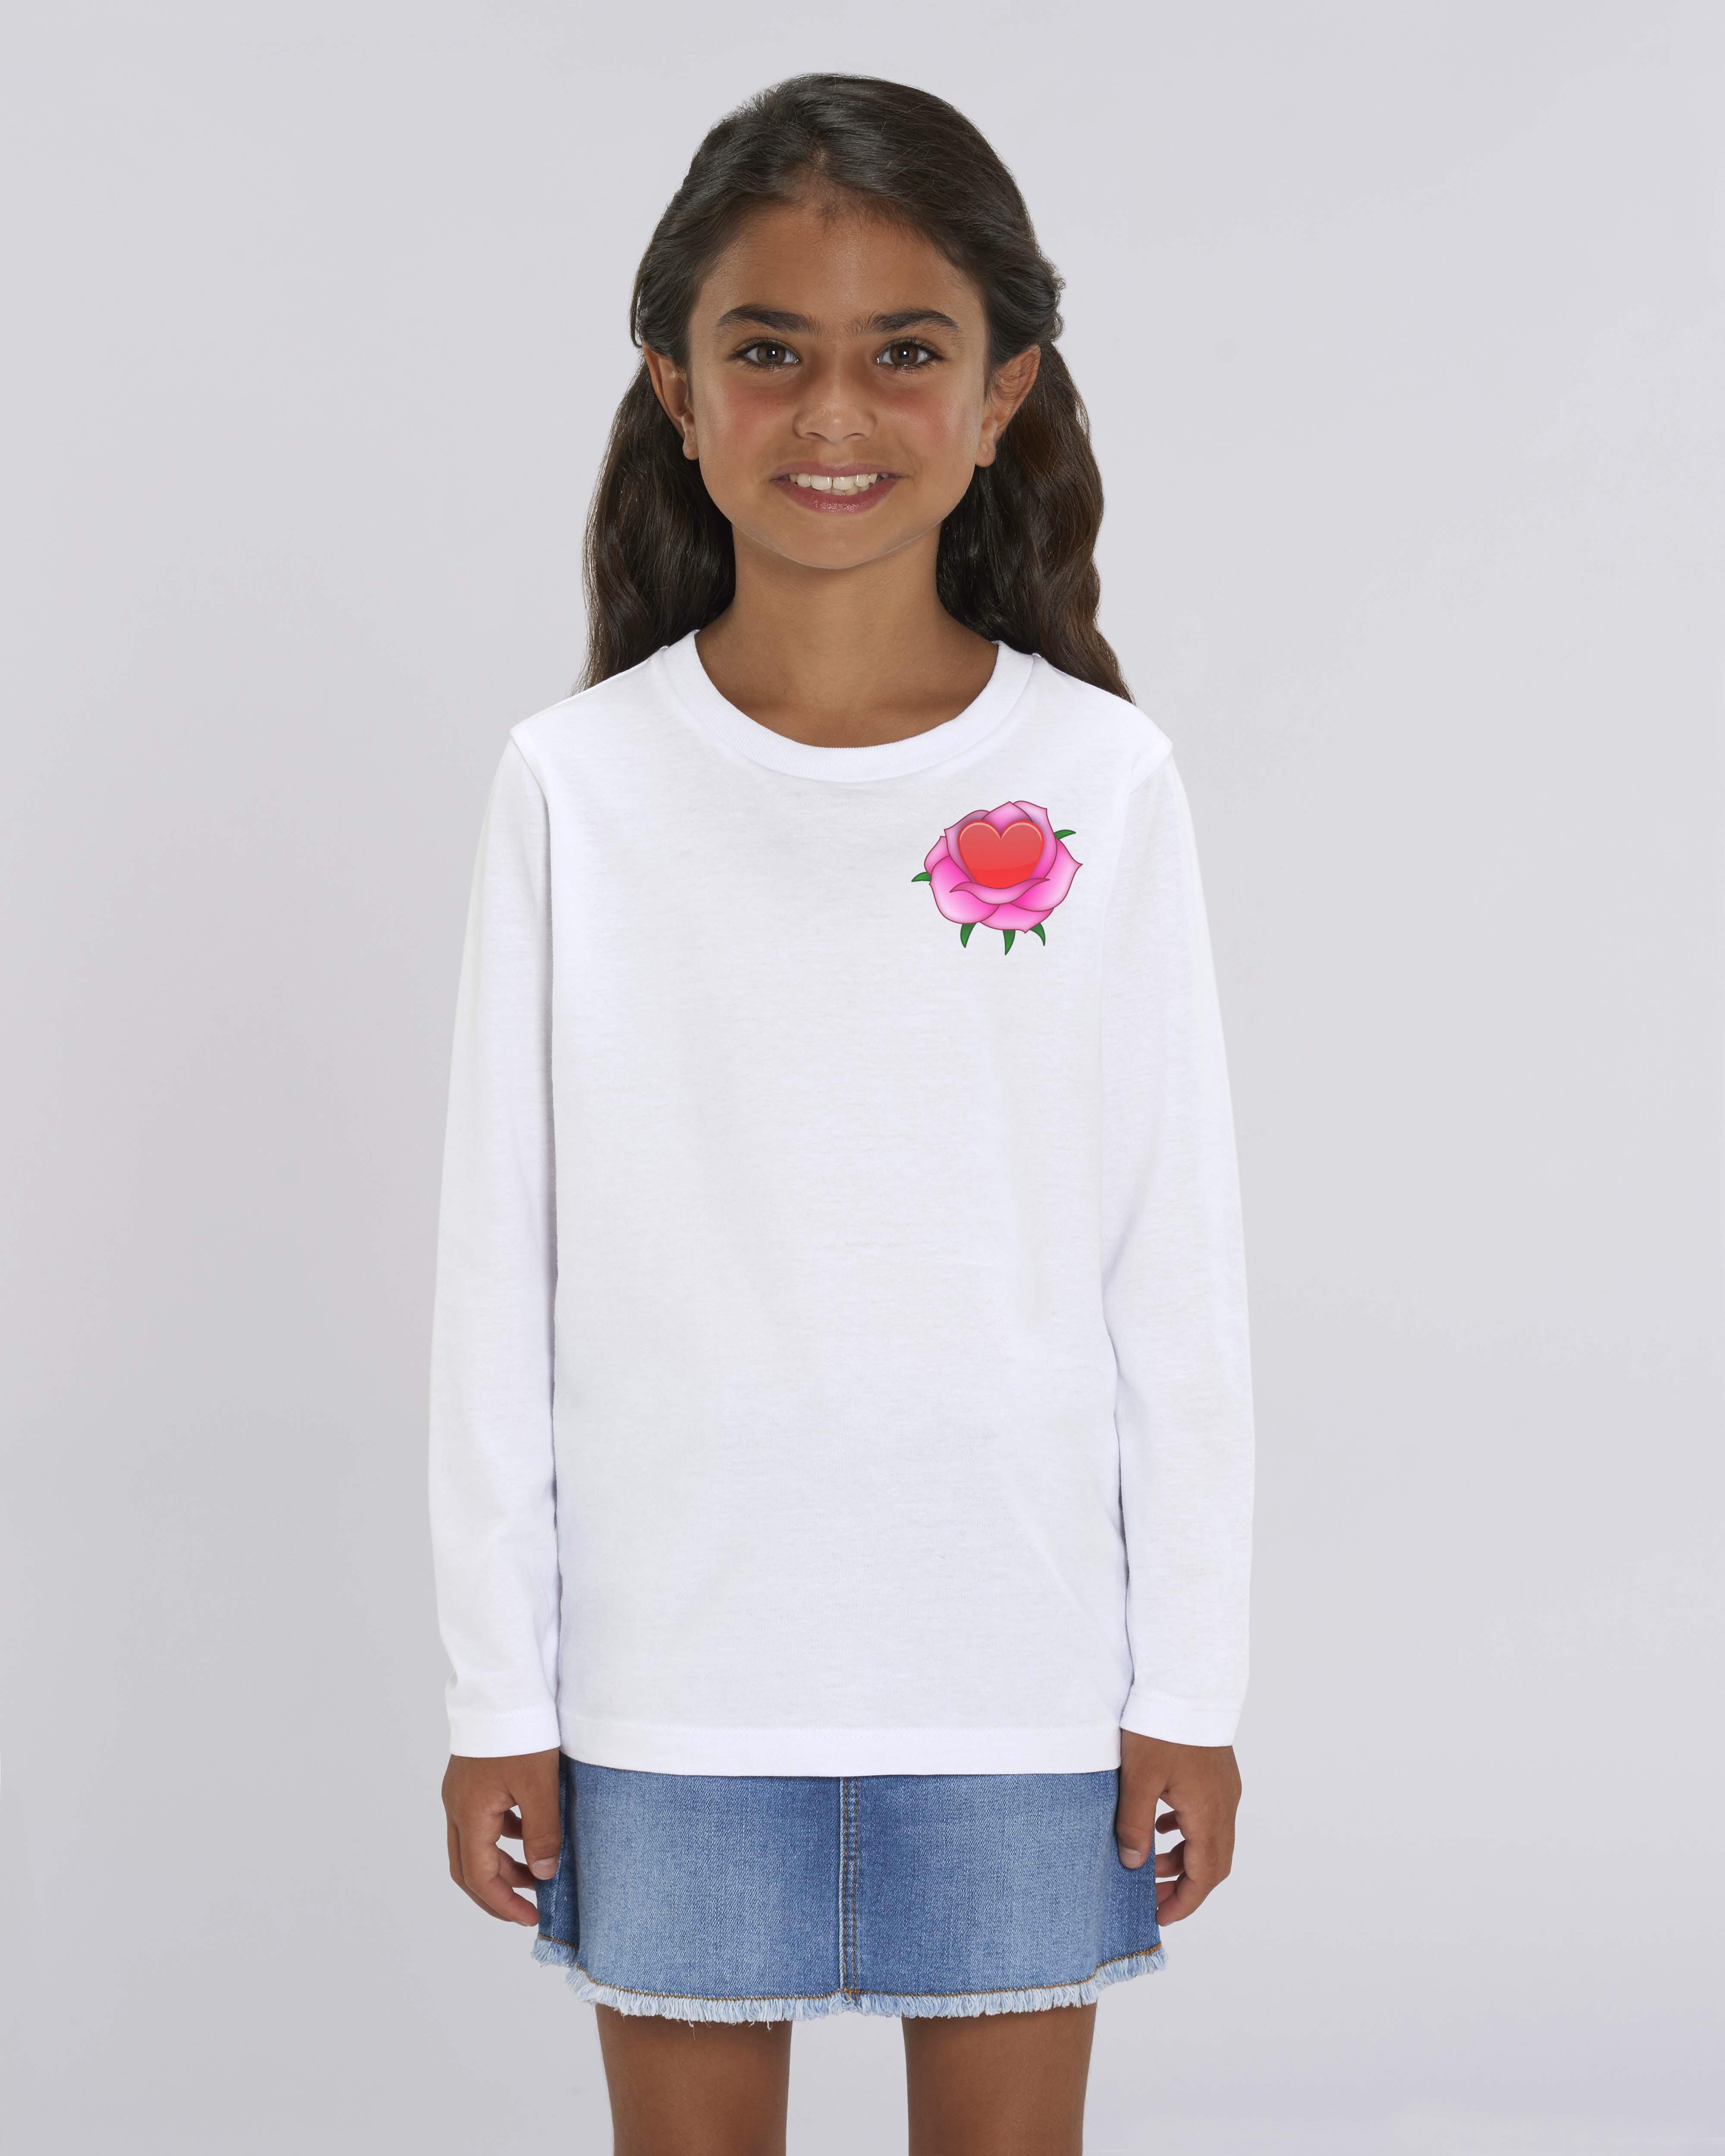 Organic white T-Shirt Child girl - Roses tee